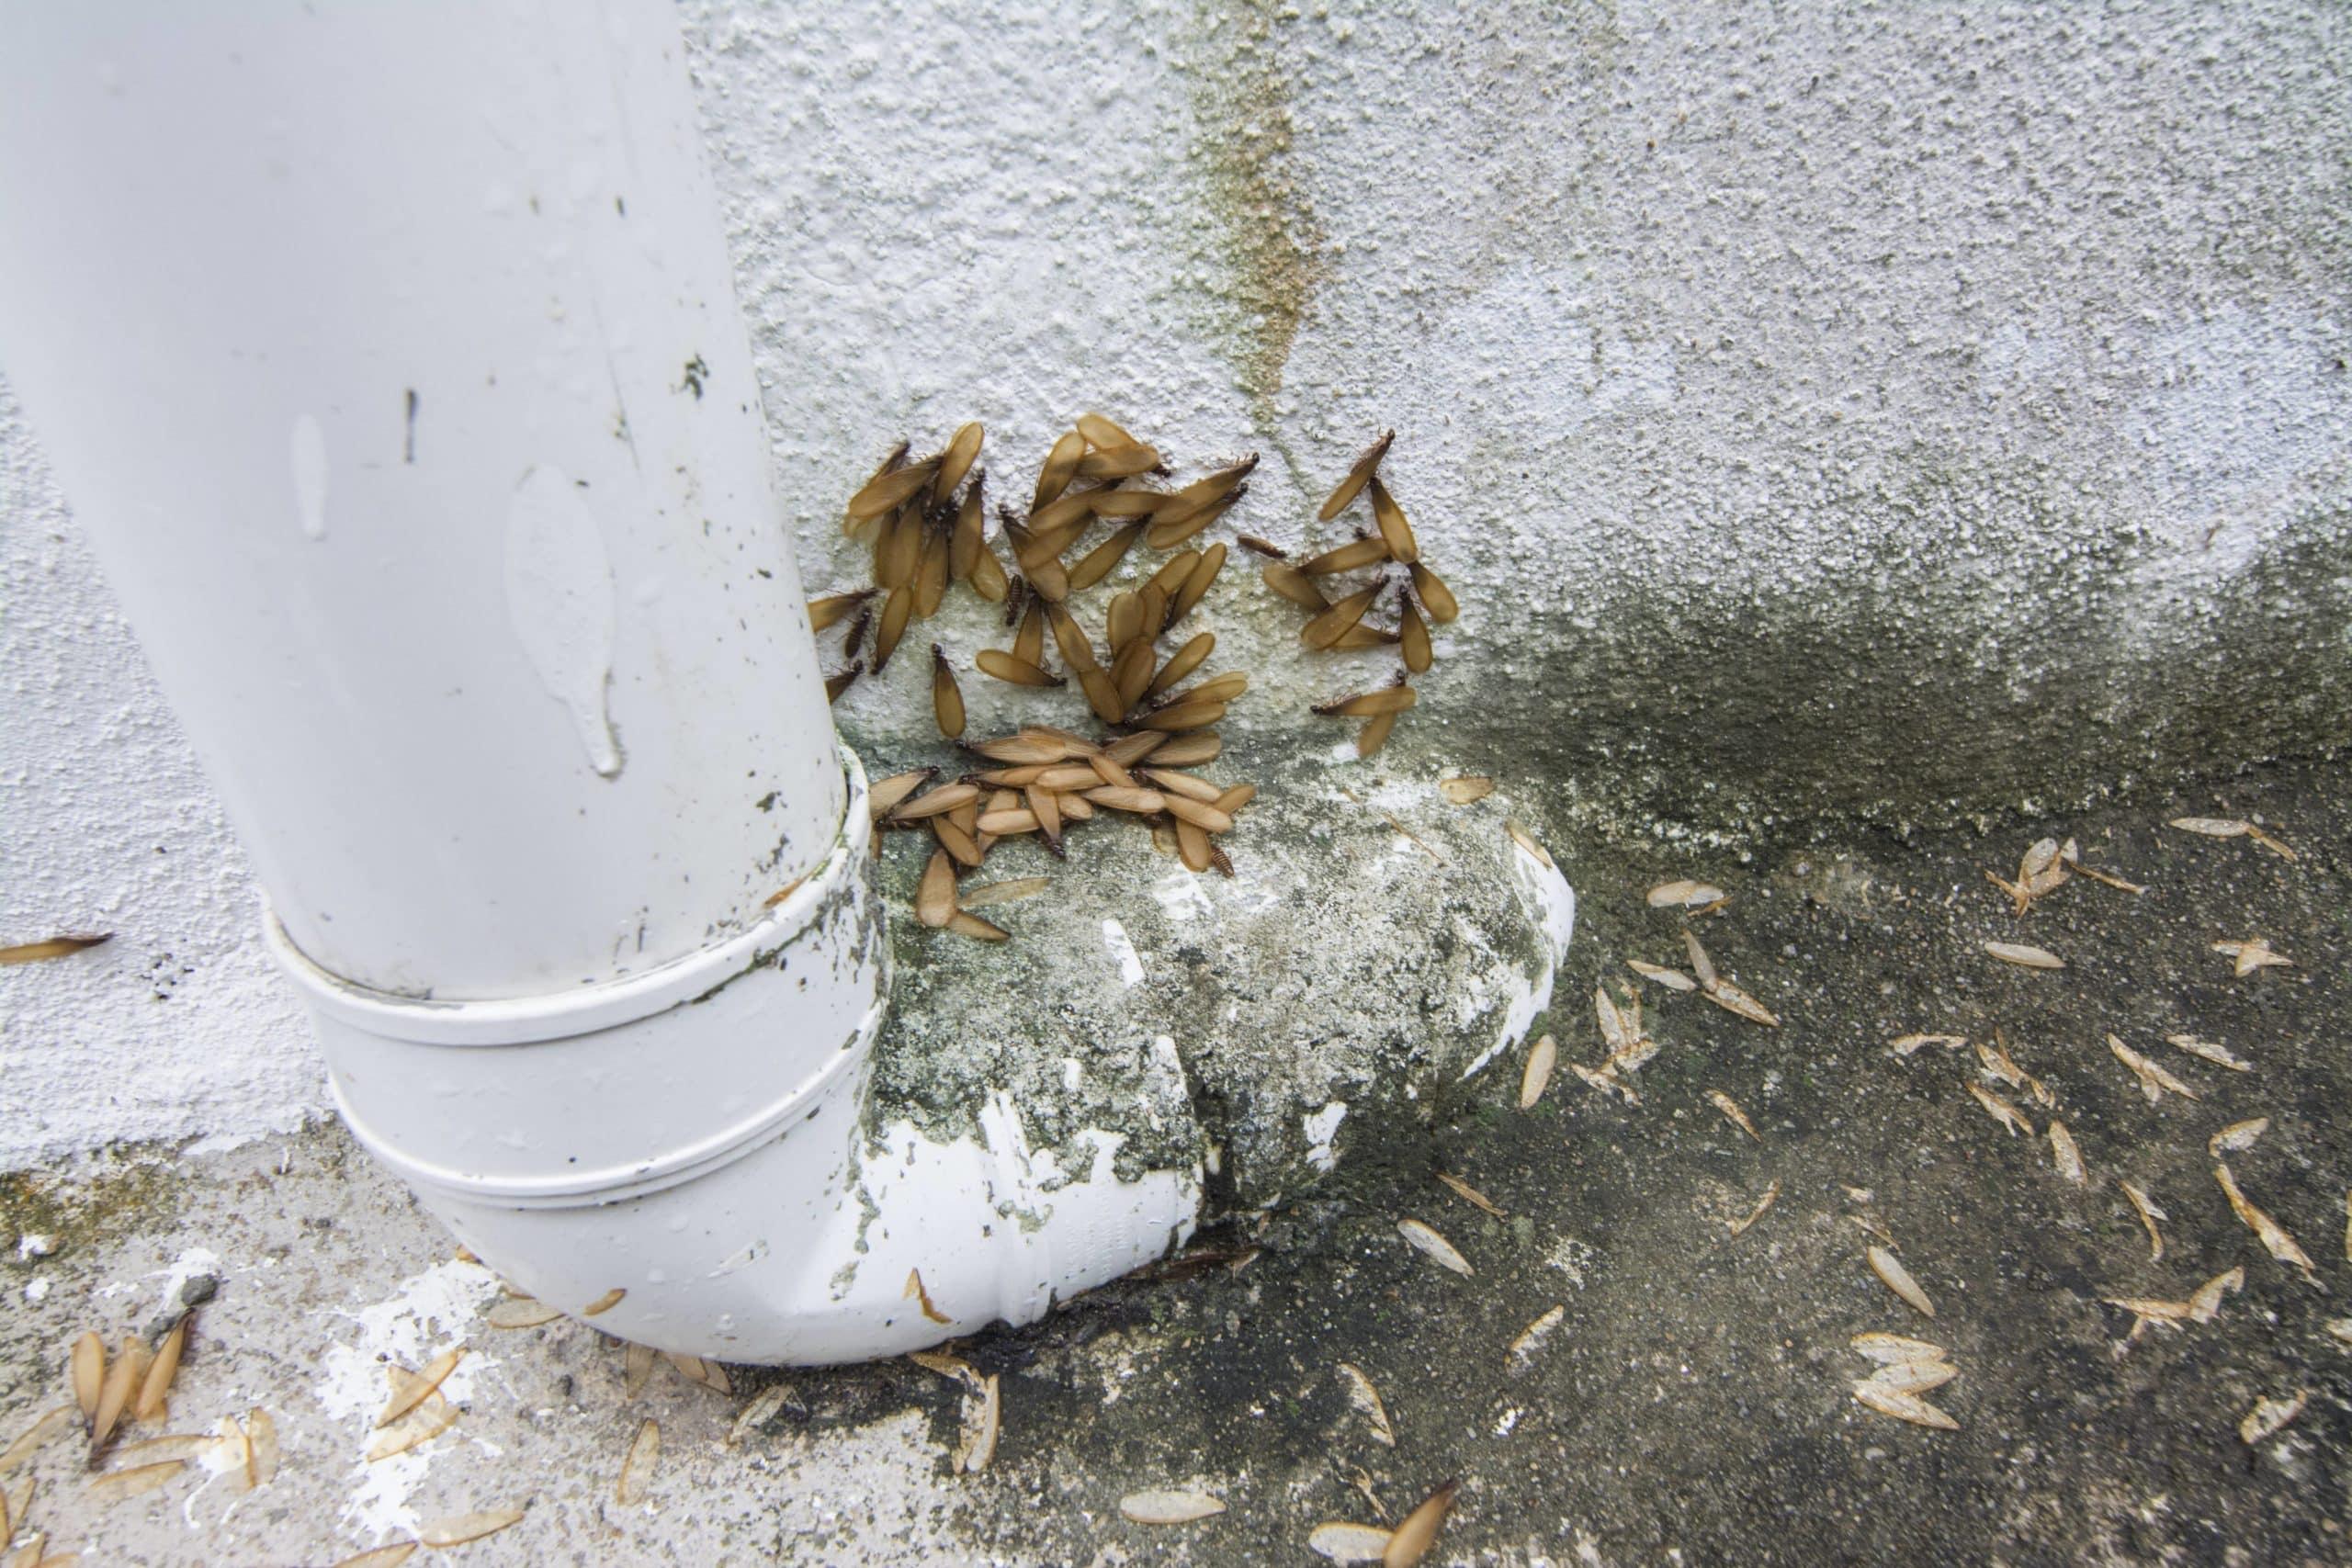 When termites swarm what to do